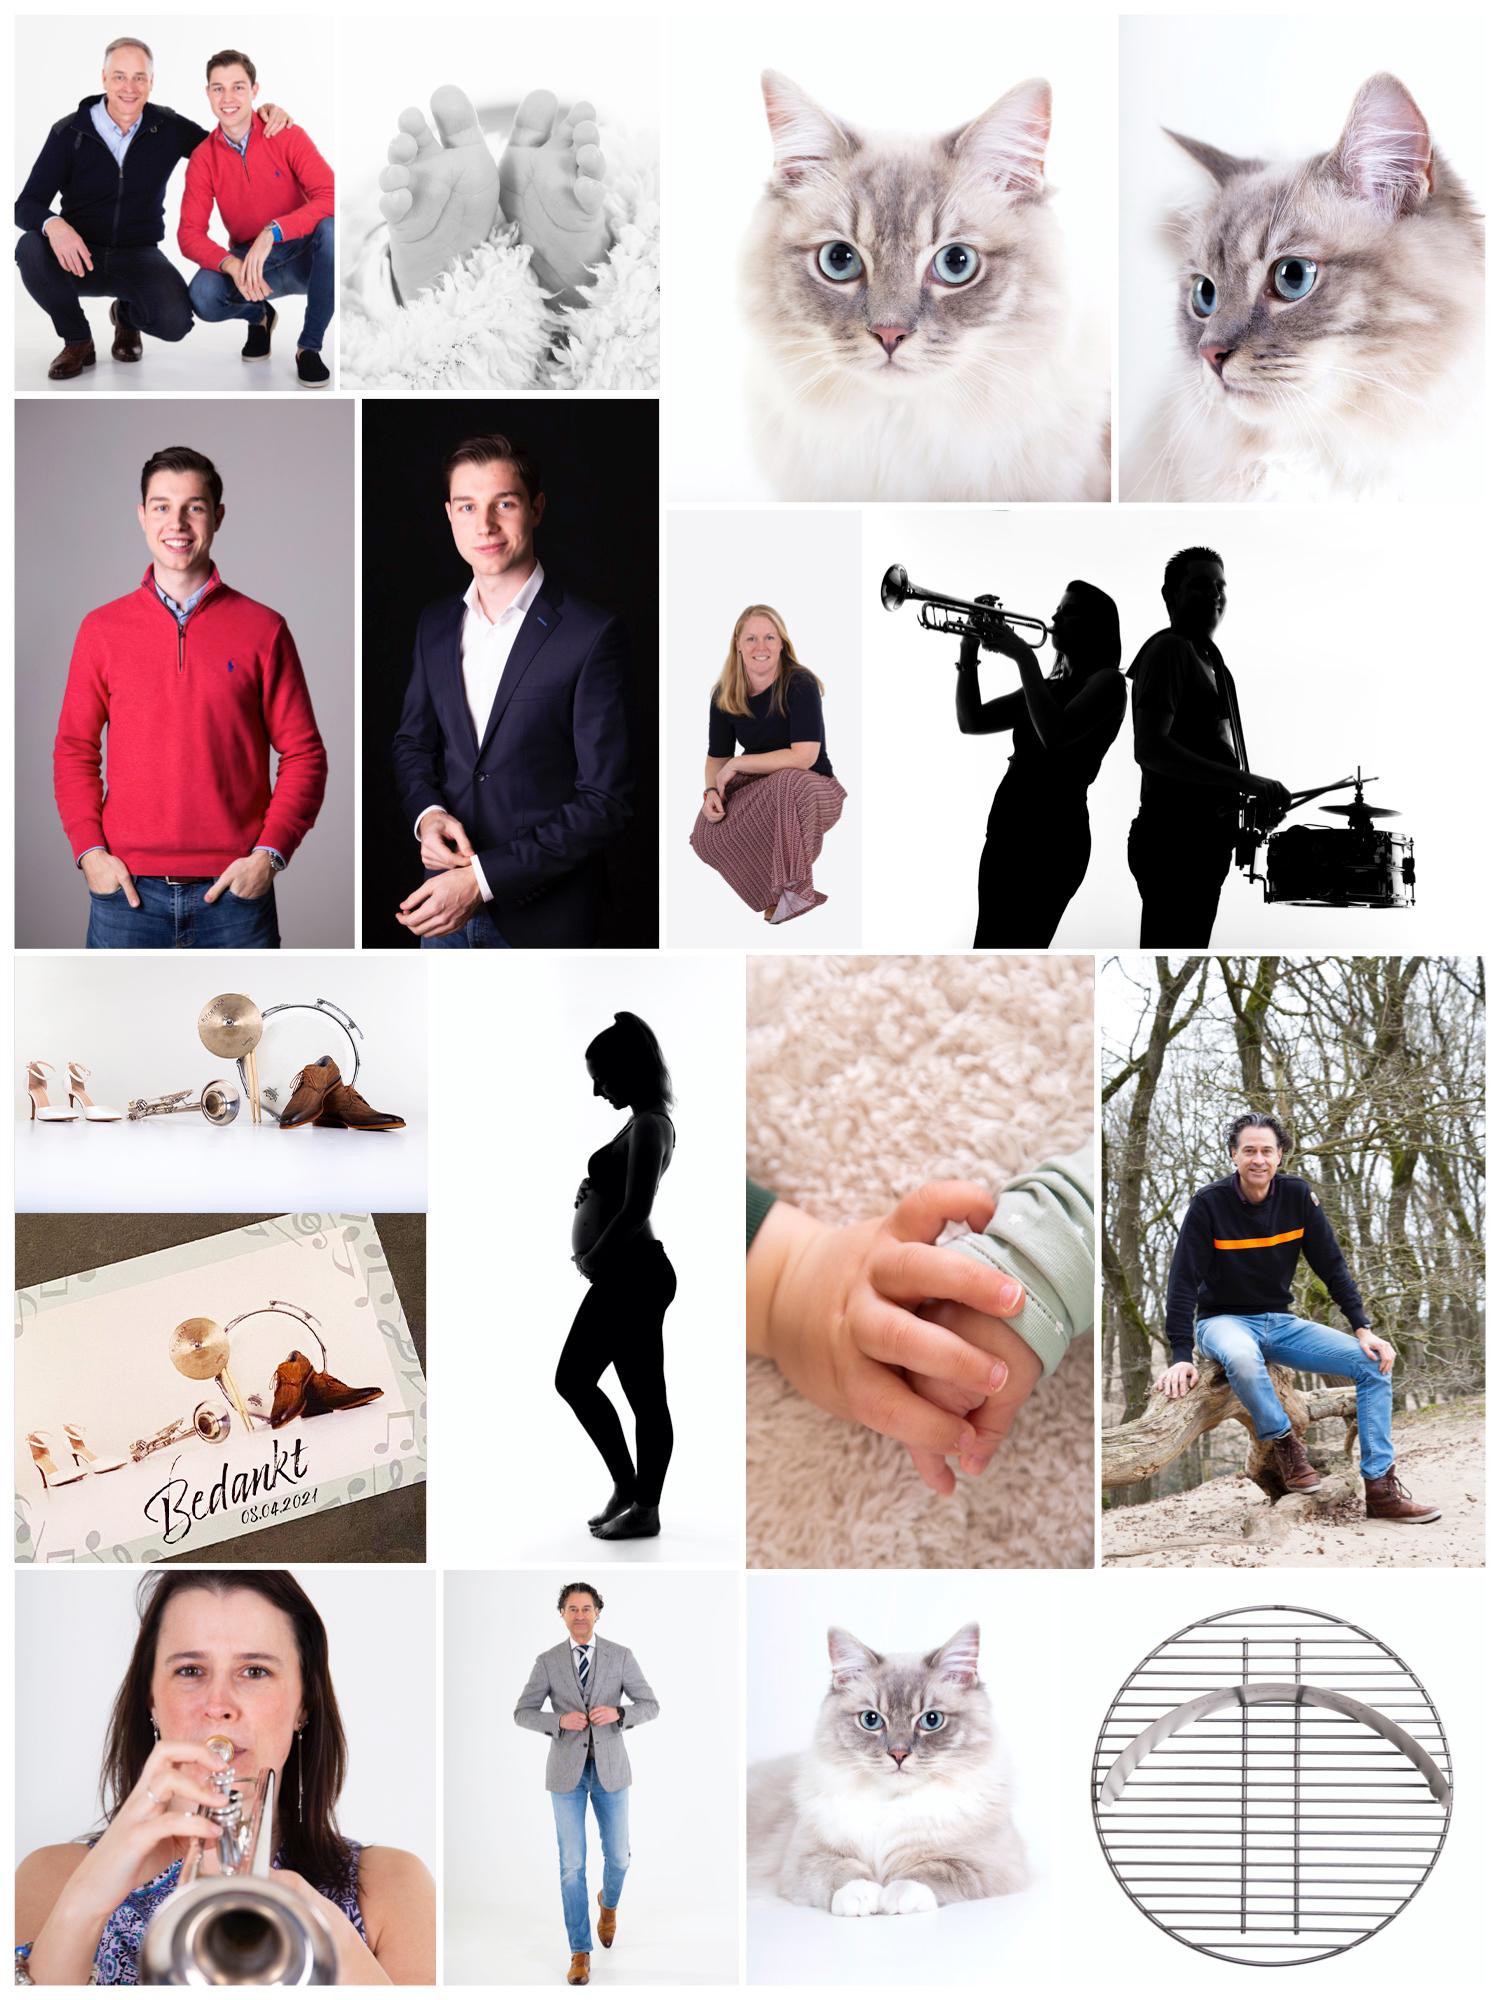 fotograaf sharon portfolio maart